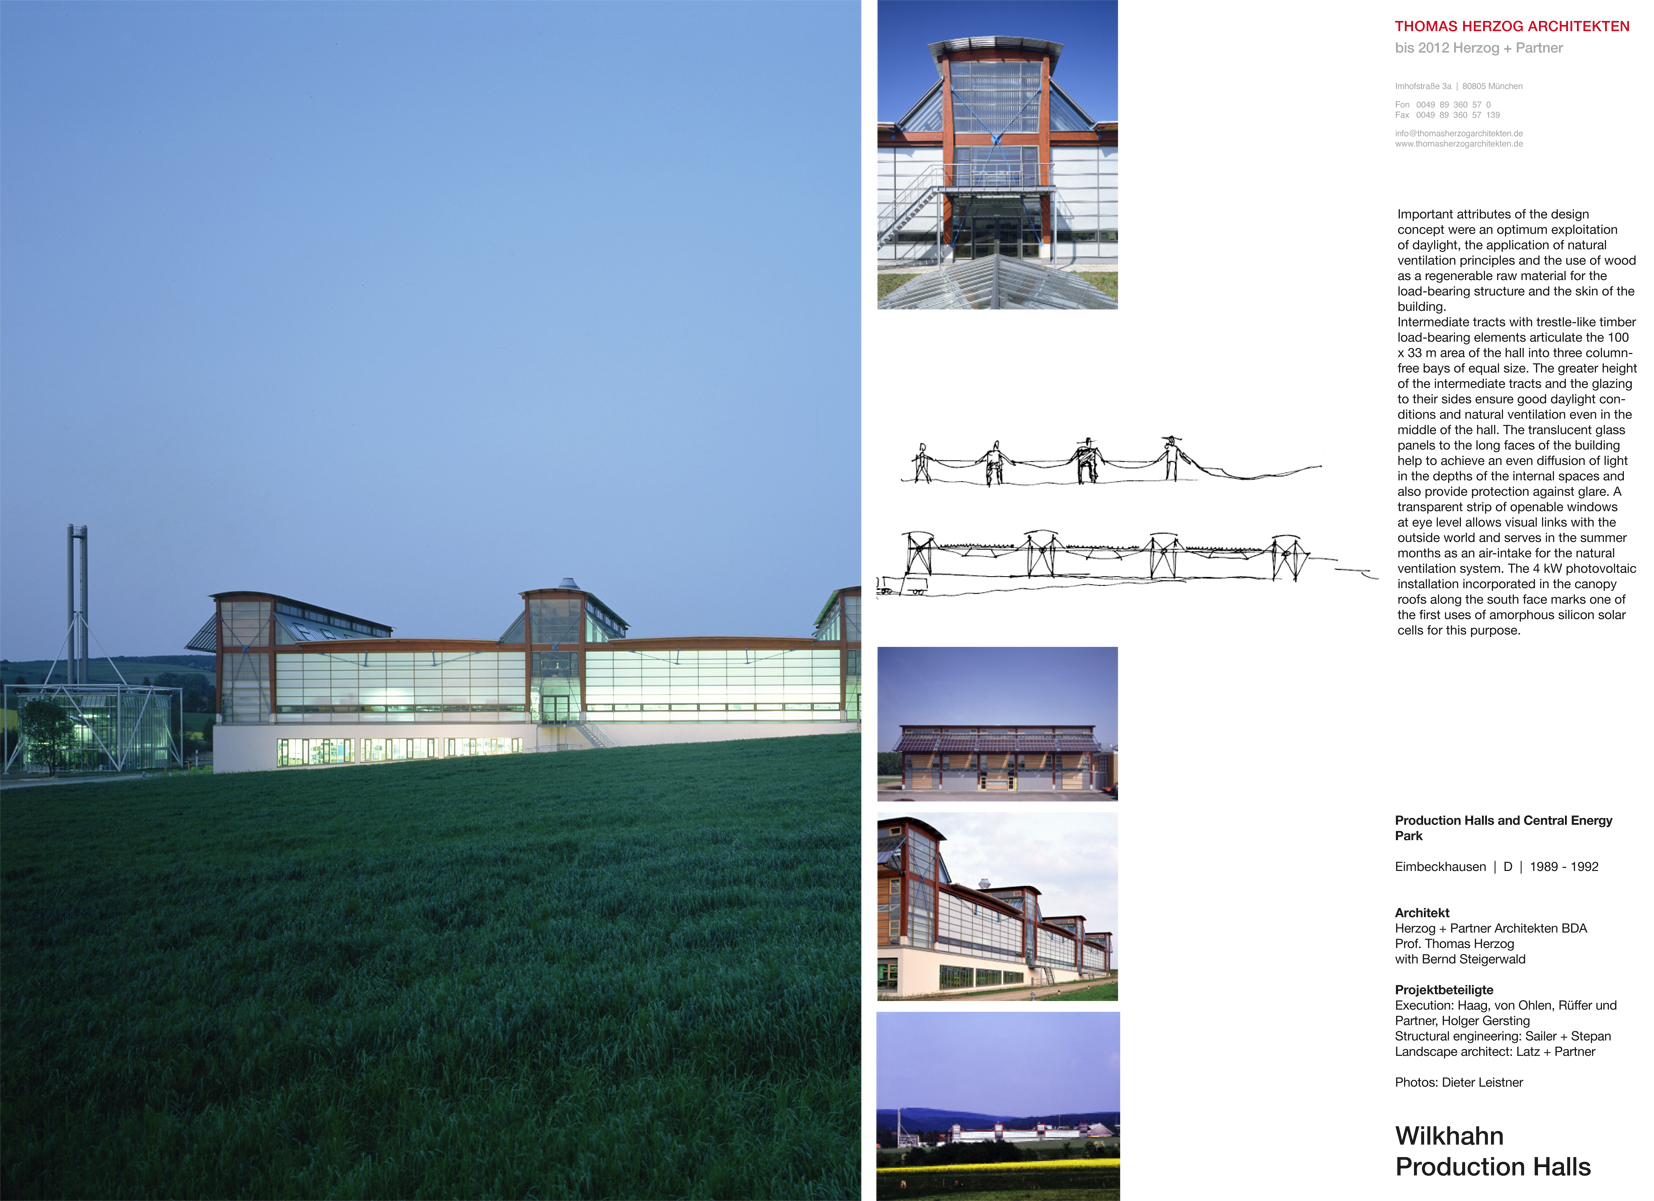 Production Halls for Wilkhahn Eimbeckhausen DE 1992